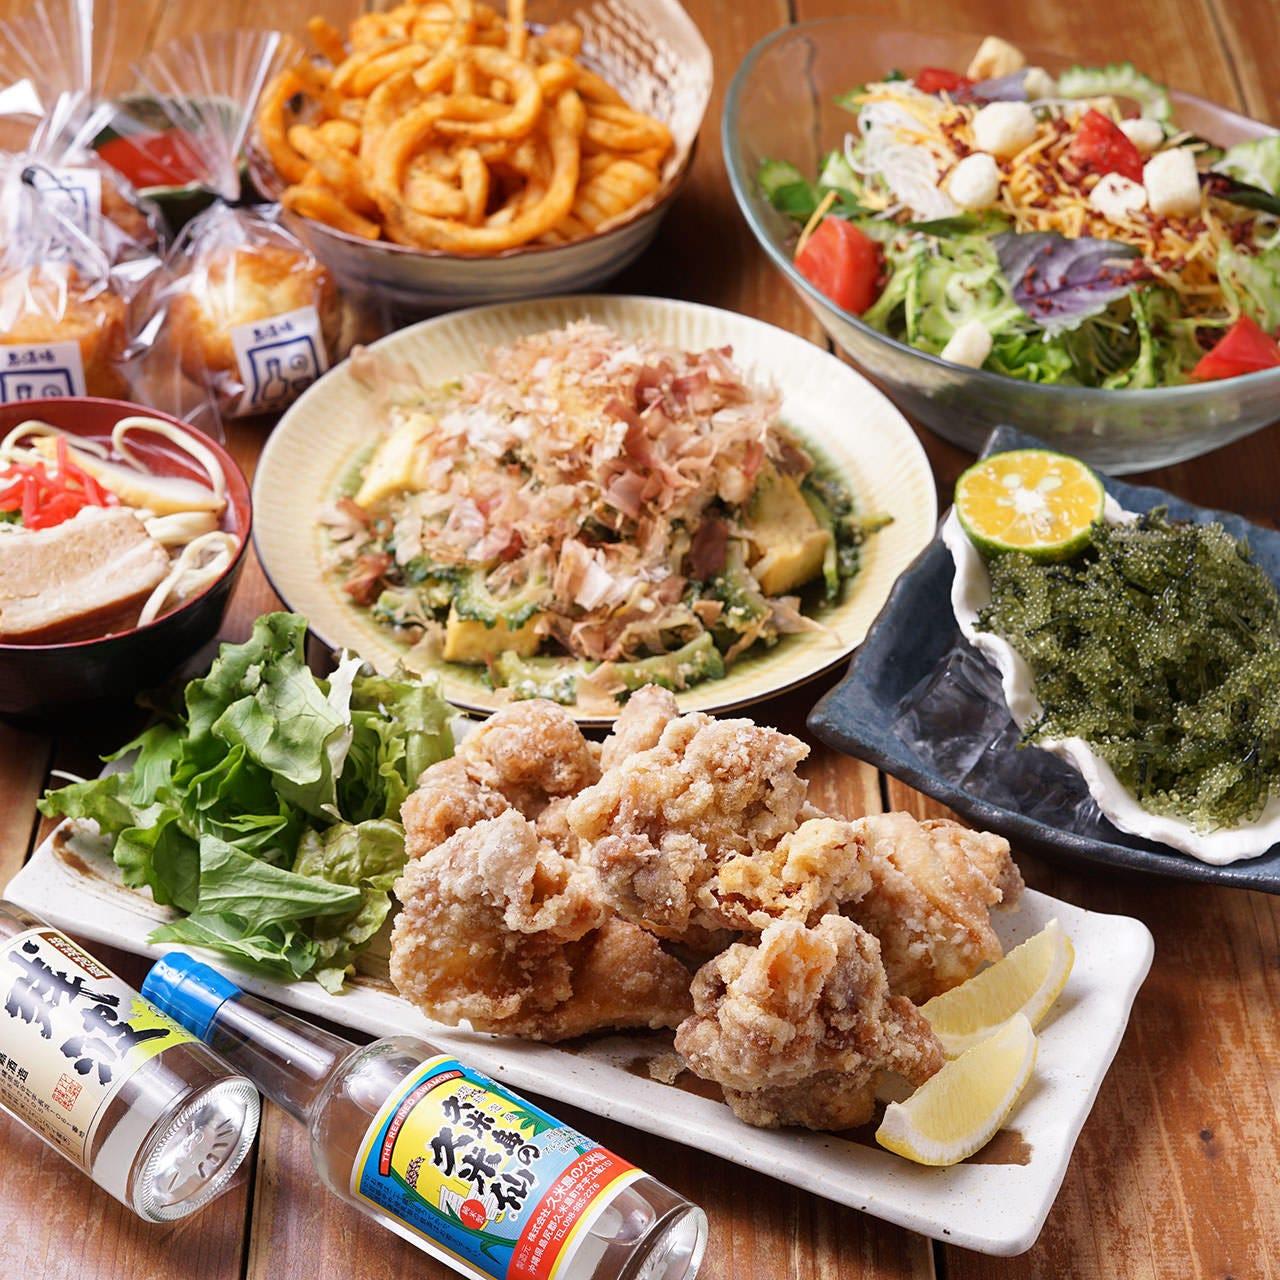 【A.美らさんコース】2h飲み放題付で忘年会♪2名様からご利用可能★お馴染みの沖縄料理